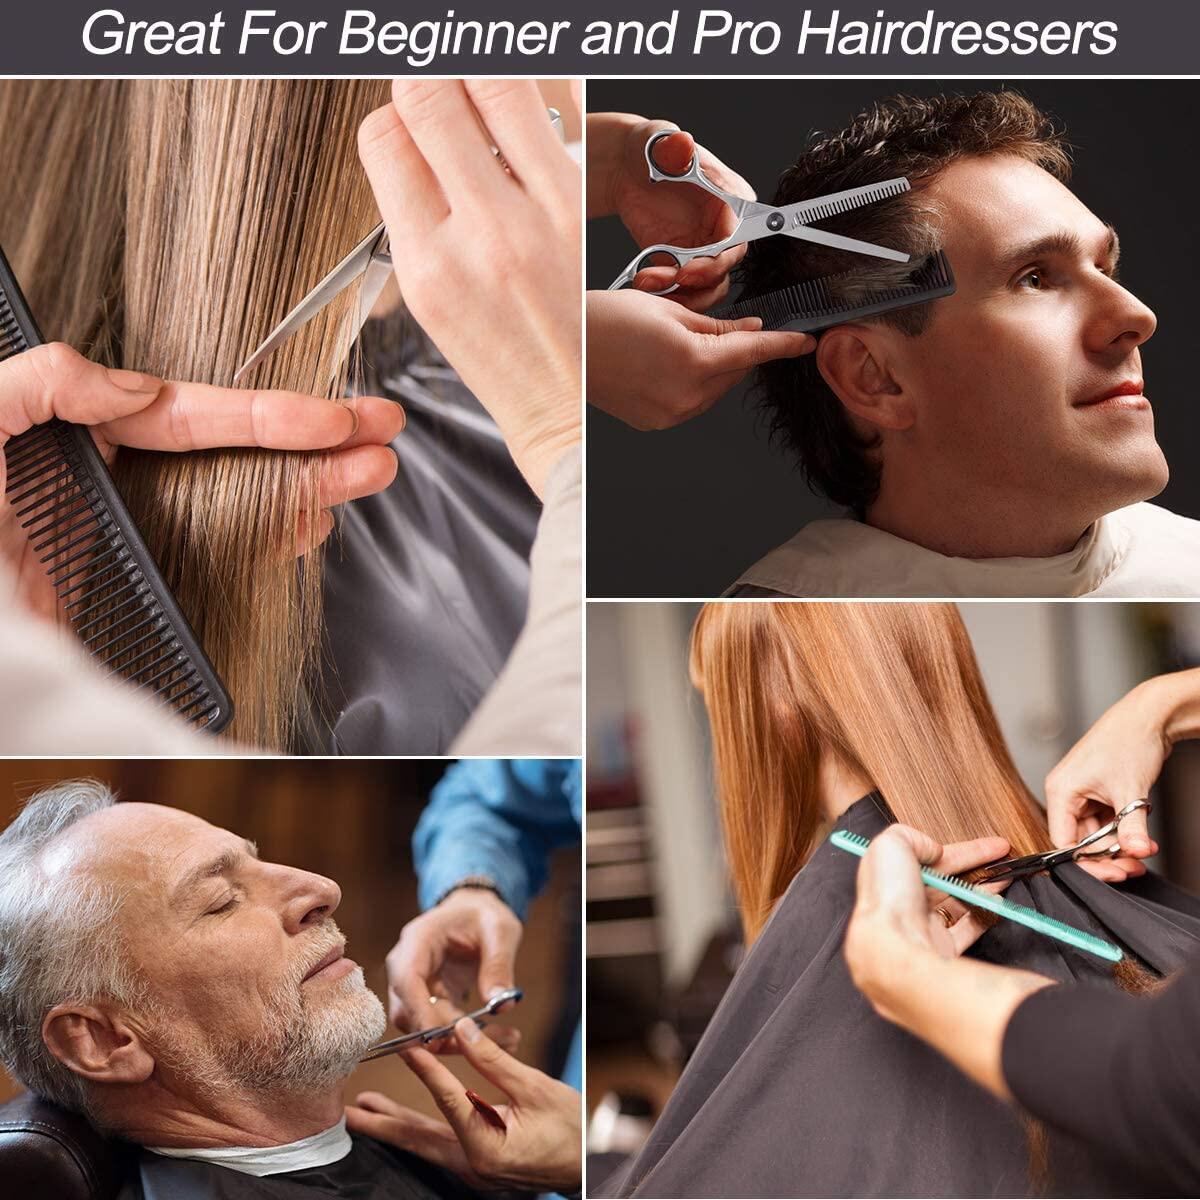 Professional Hair Cutting Scissors Set 11 PCS Hair Cutting Scissors Thinning Shears Multi-Use Haircut Kit Scissors Hair Cutting Shears Set For Barber Salon Home Hair Cutting Scissors